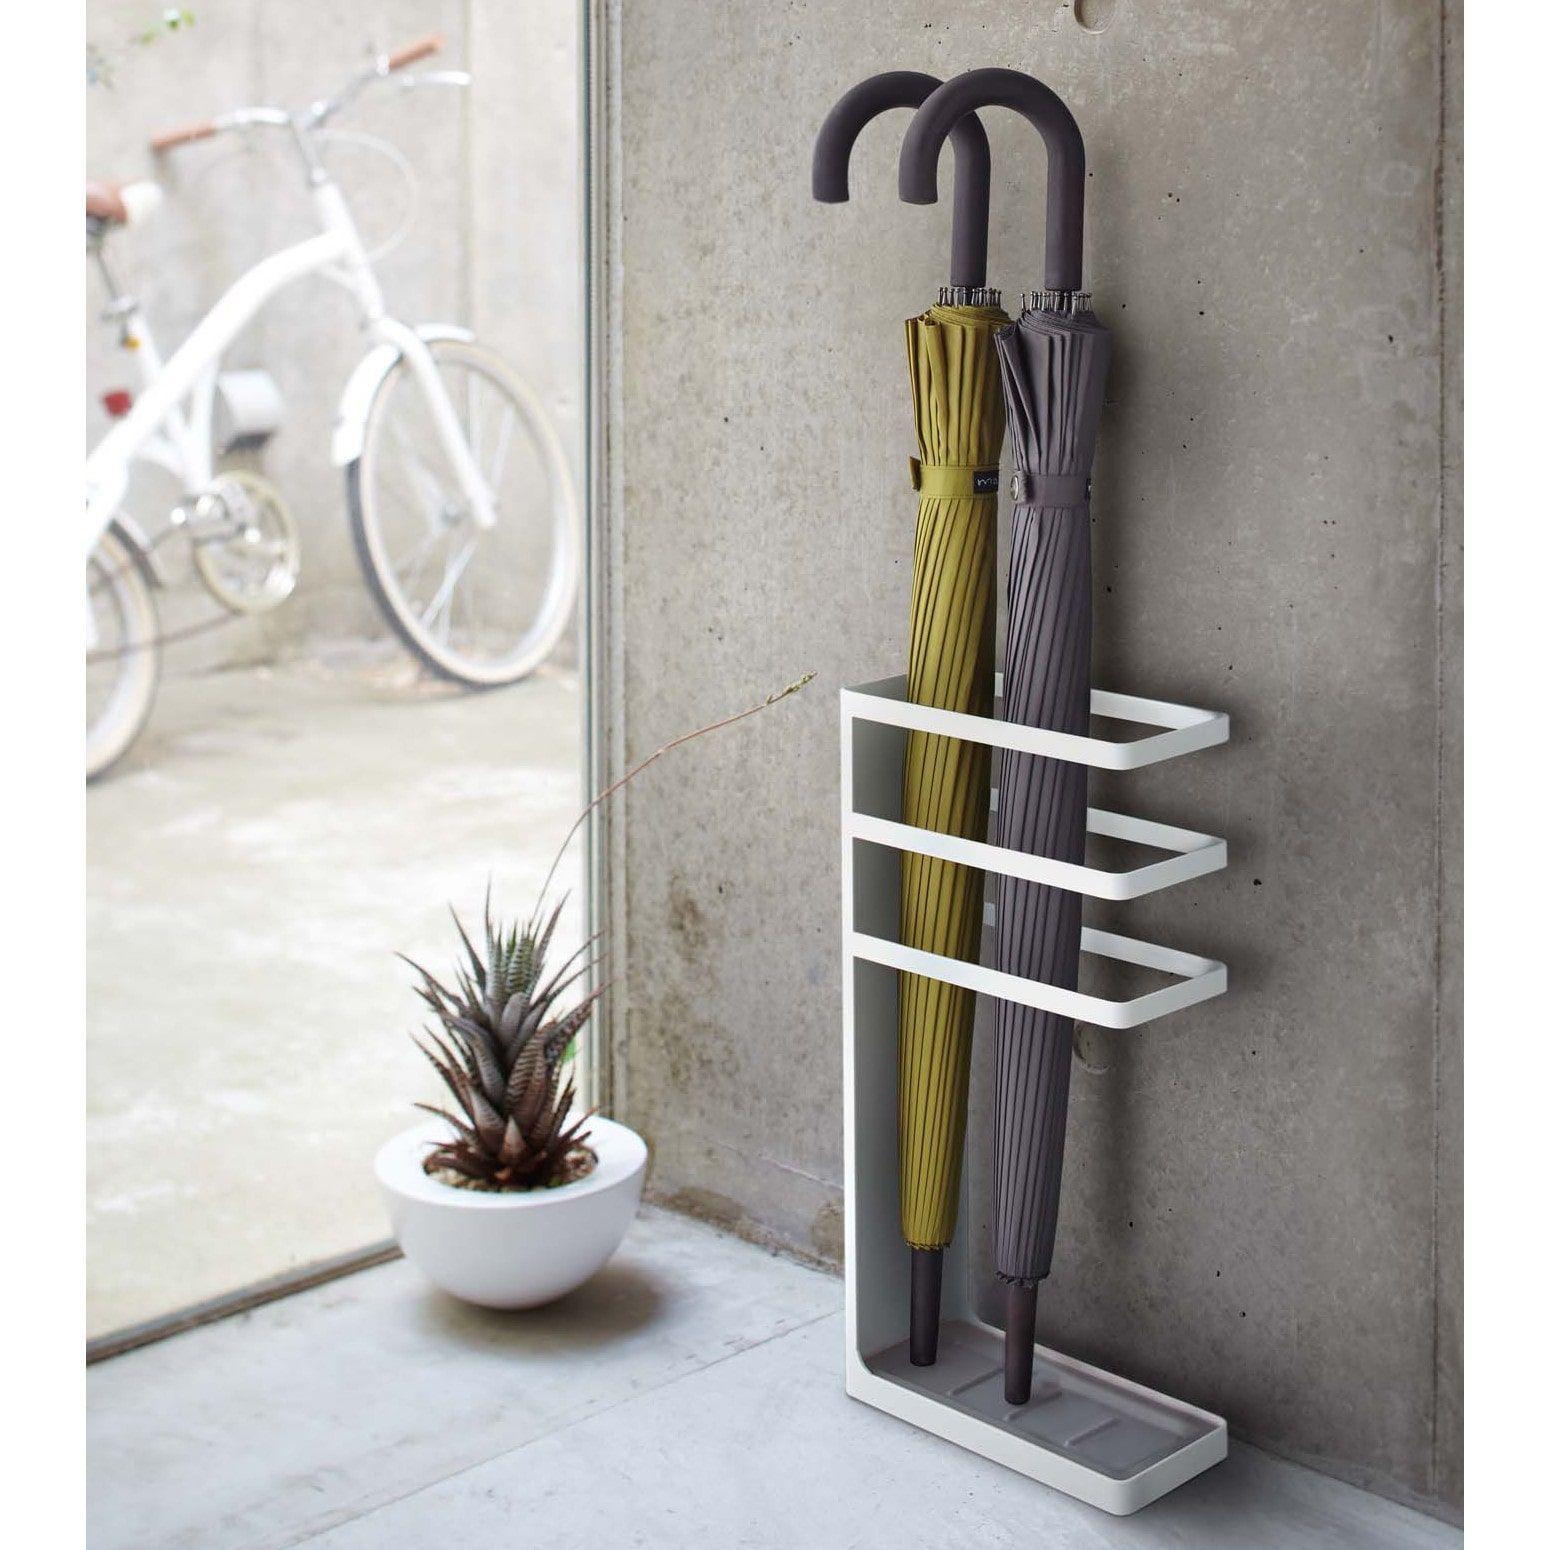 Flure Haus Deko Und Flur Design: Yamazaki Layer Metal Umbrella Stand (Black) In 2019